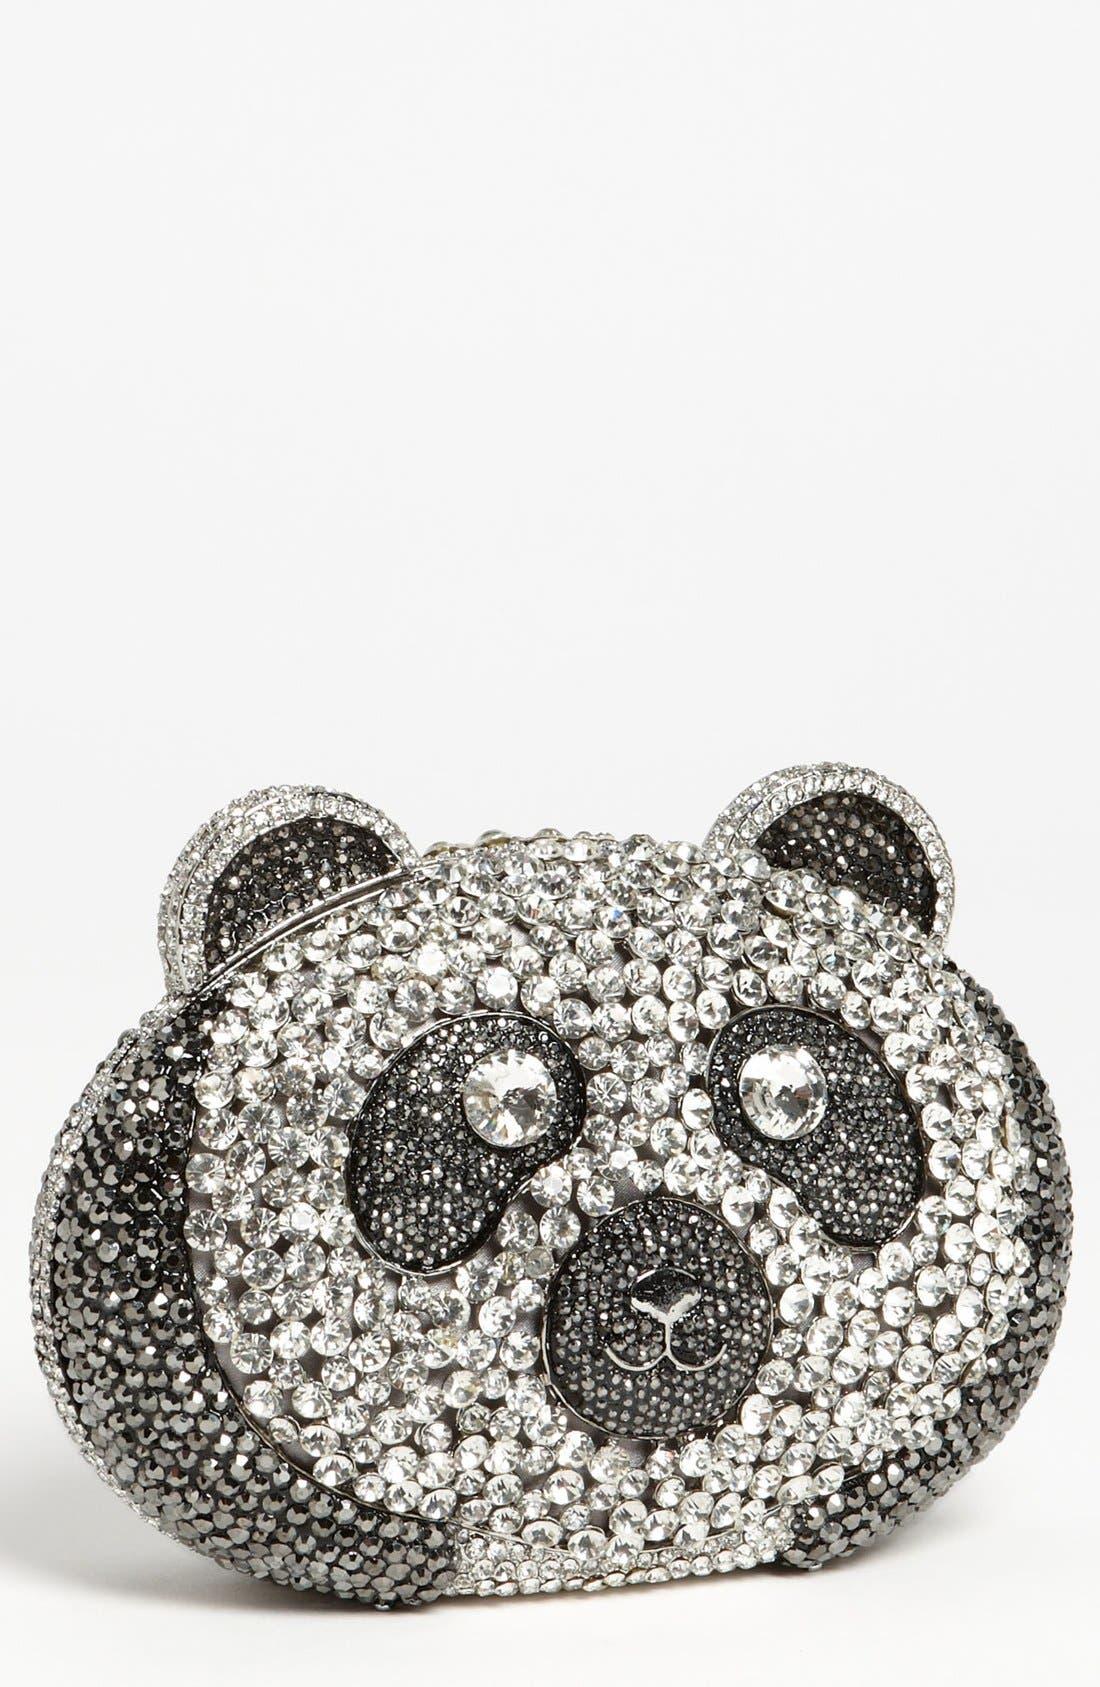 Alternate Image 1 Selected - Natasha Couture Panda Clutch